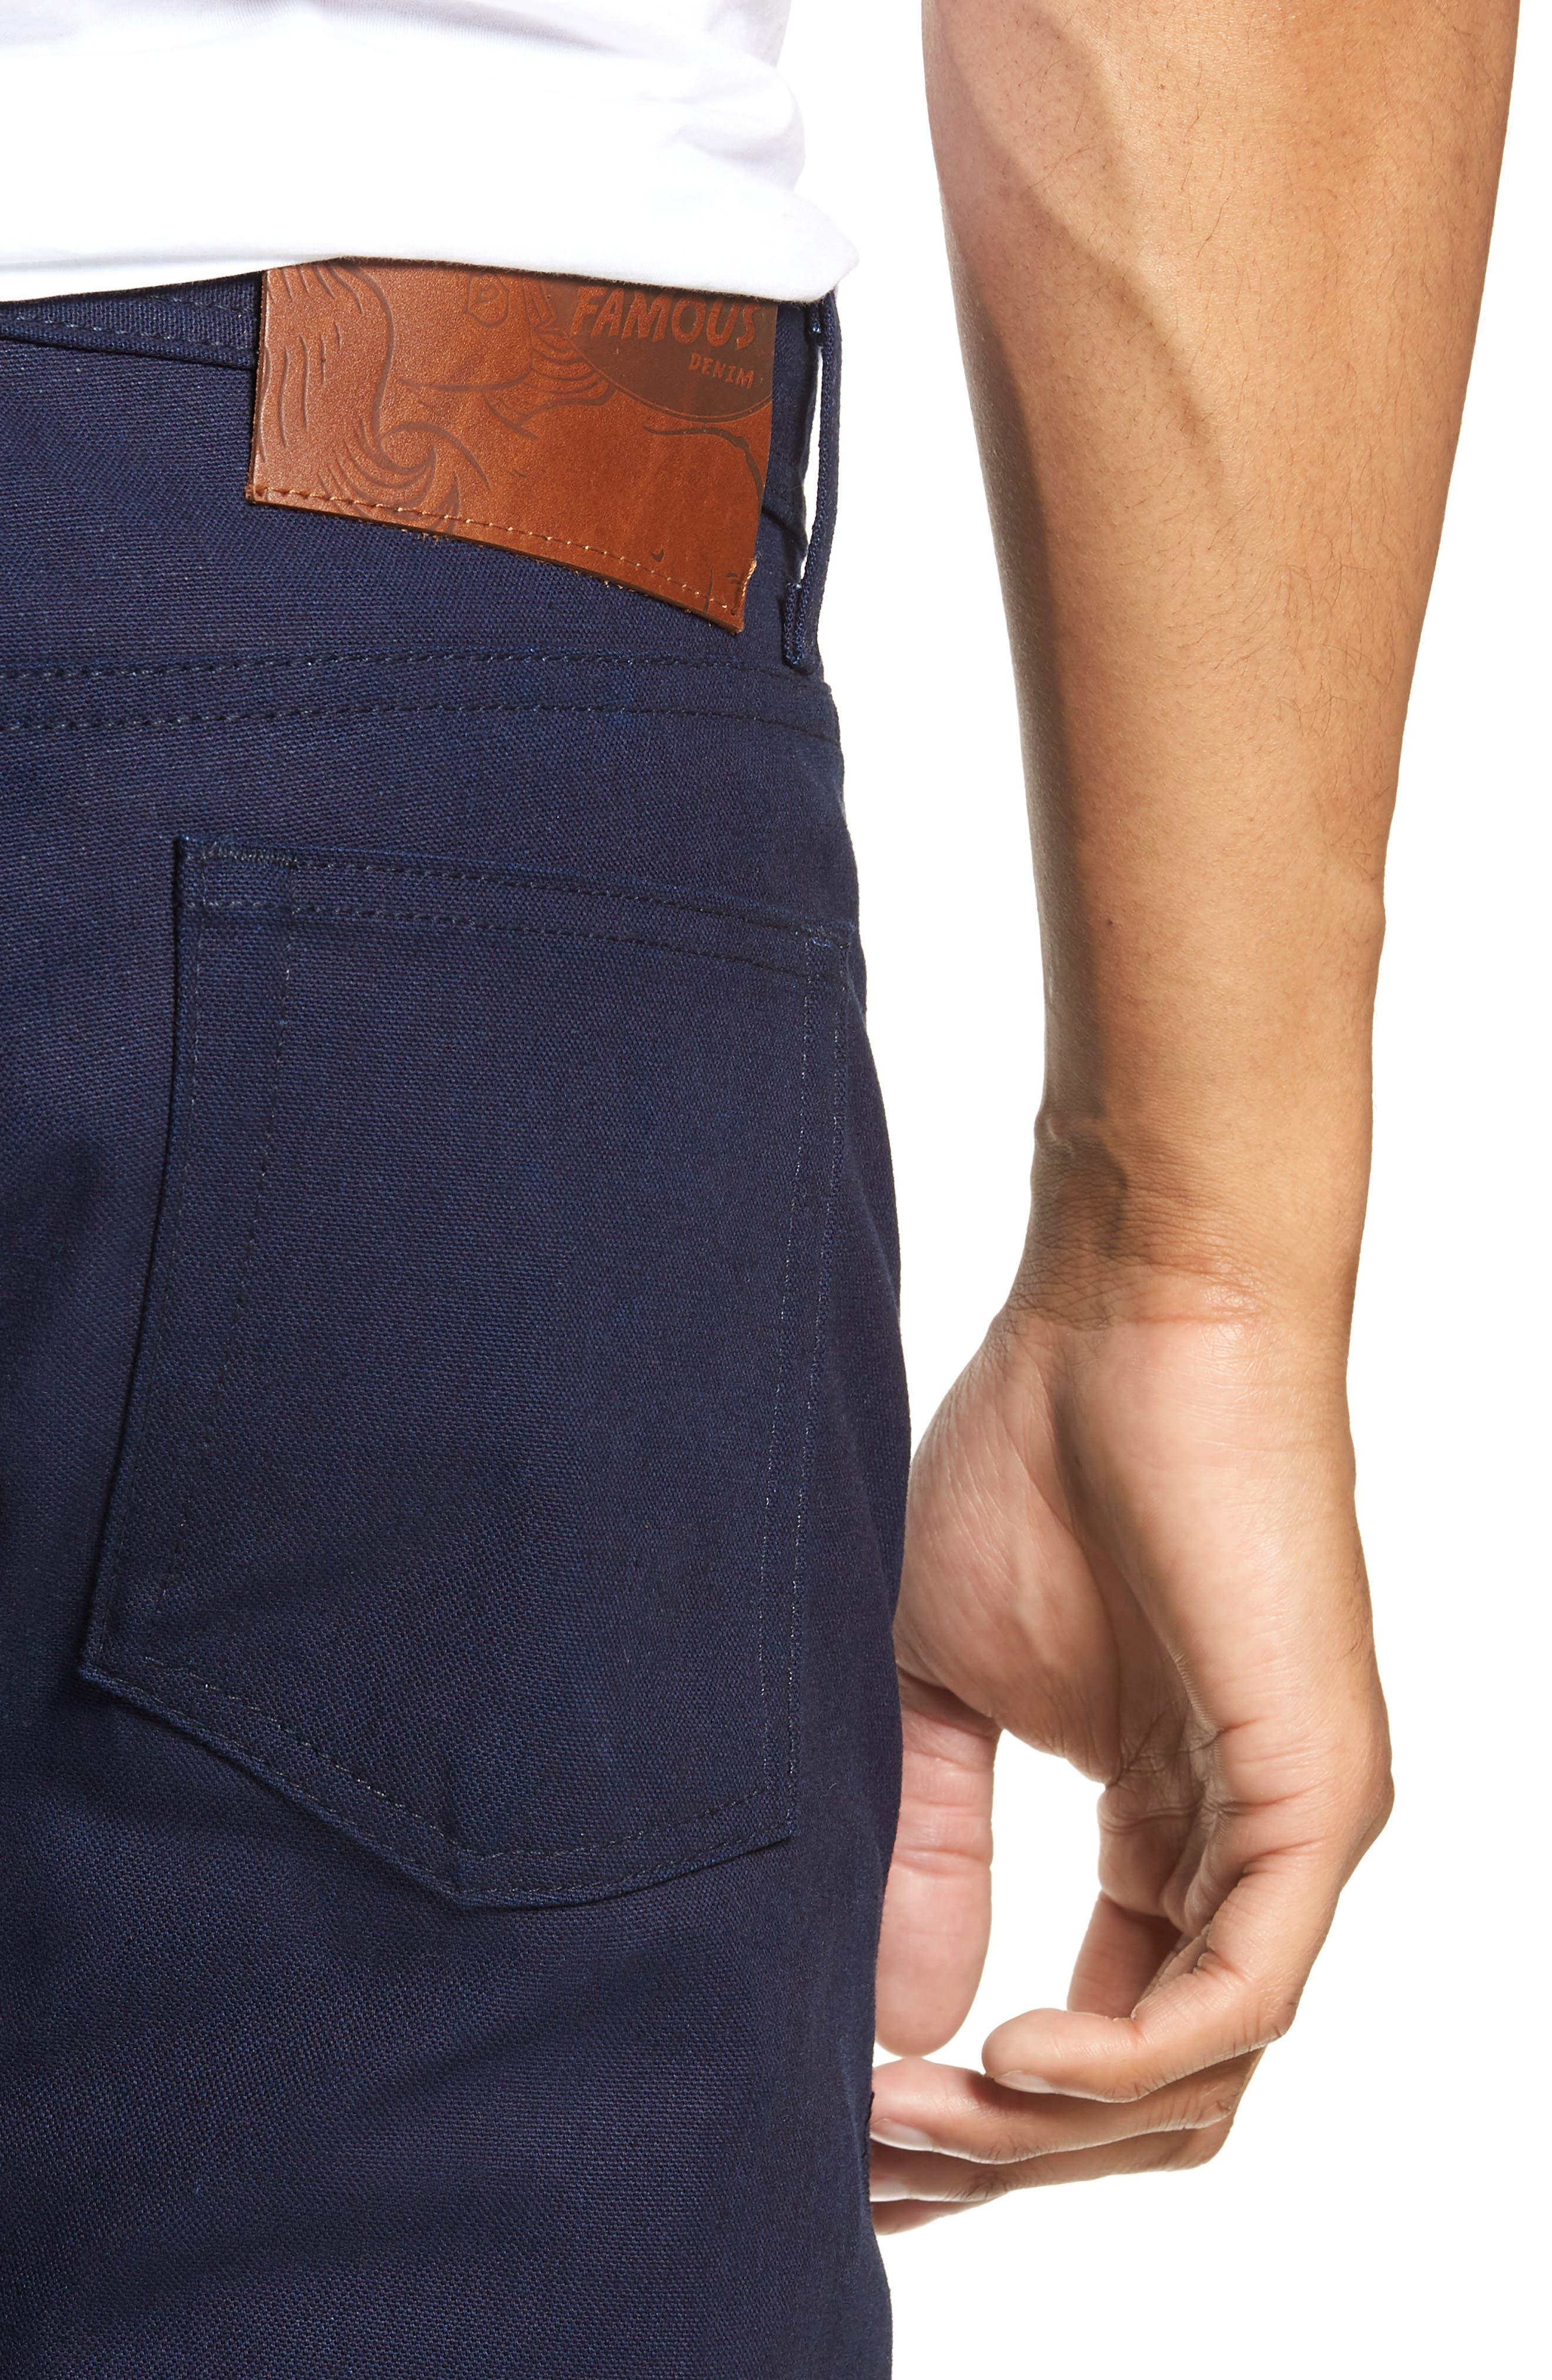 Weird Guy Slim Fit Jeans,                             Alternate thumbnail 4, color,                             INDIGO DUCK CANVAS SELVEDGE